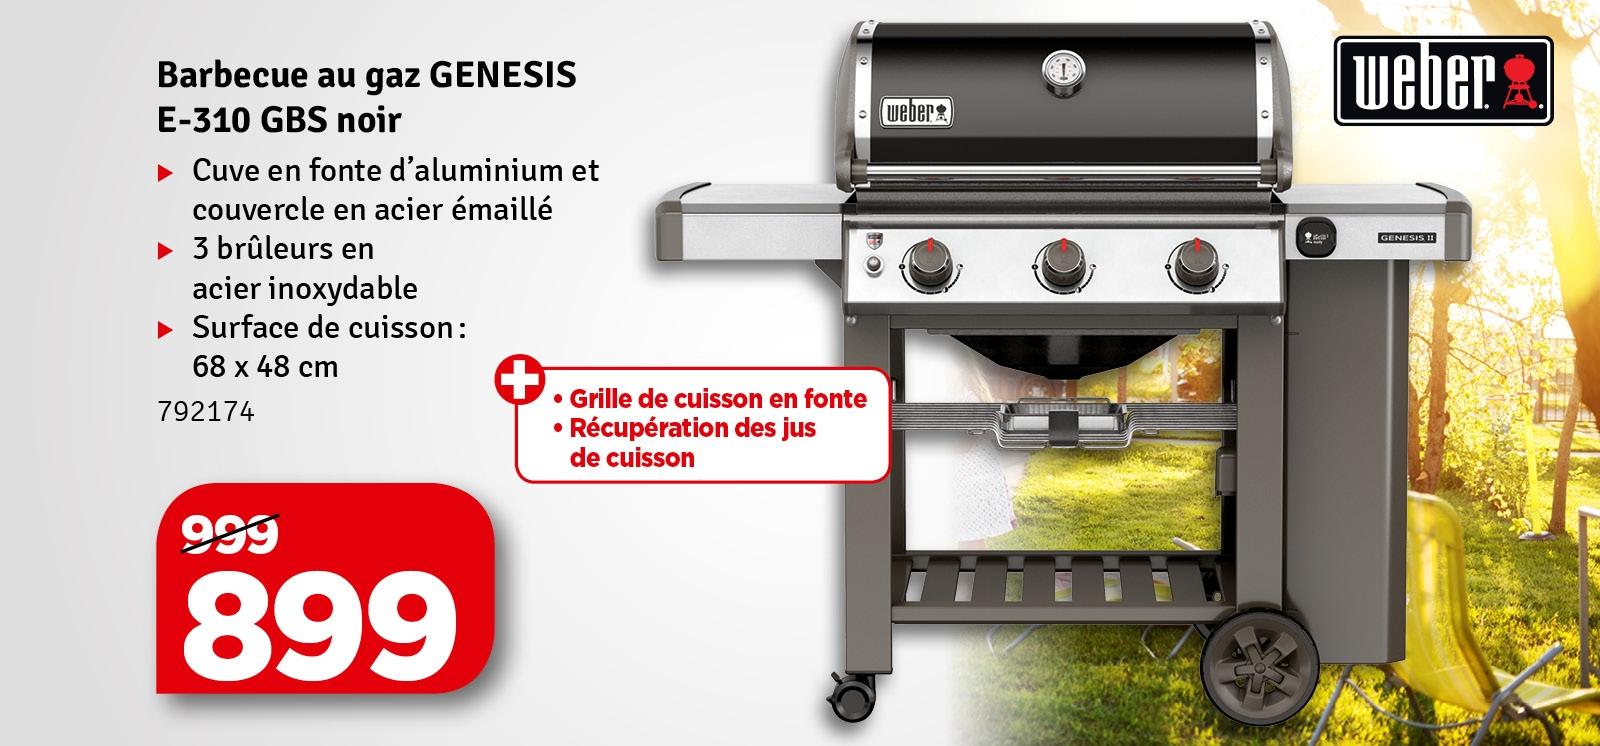 Promo - Barbecue au gaz Genesis II WEBER